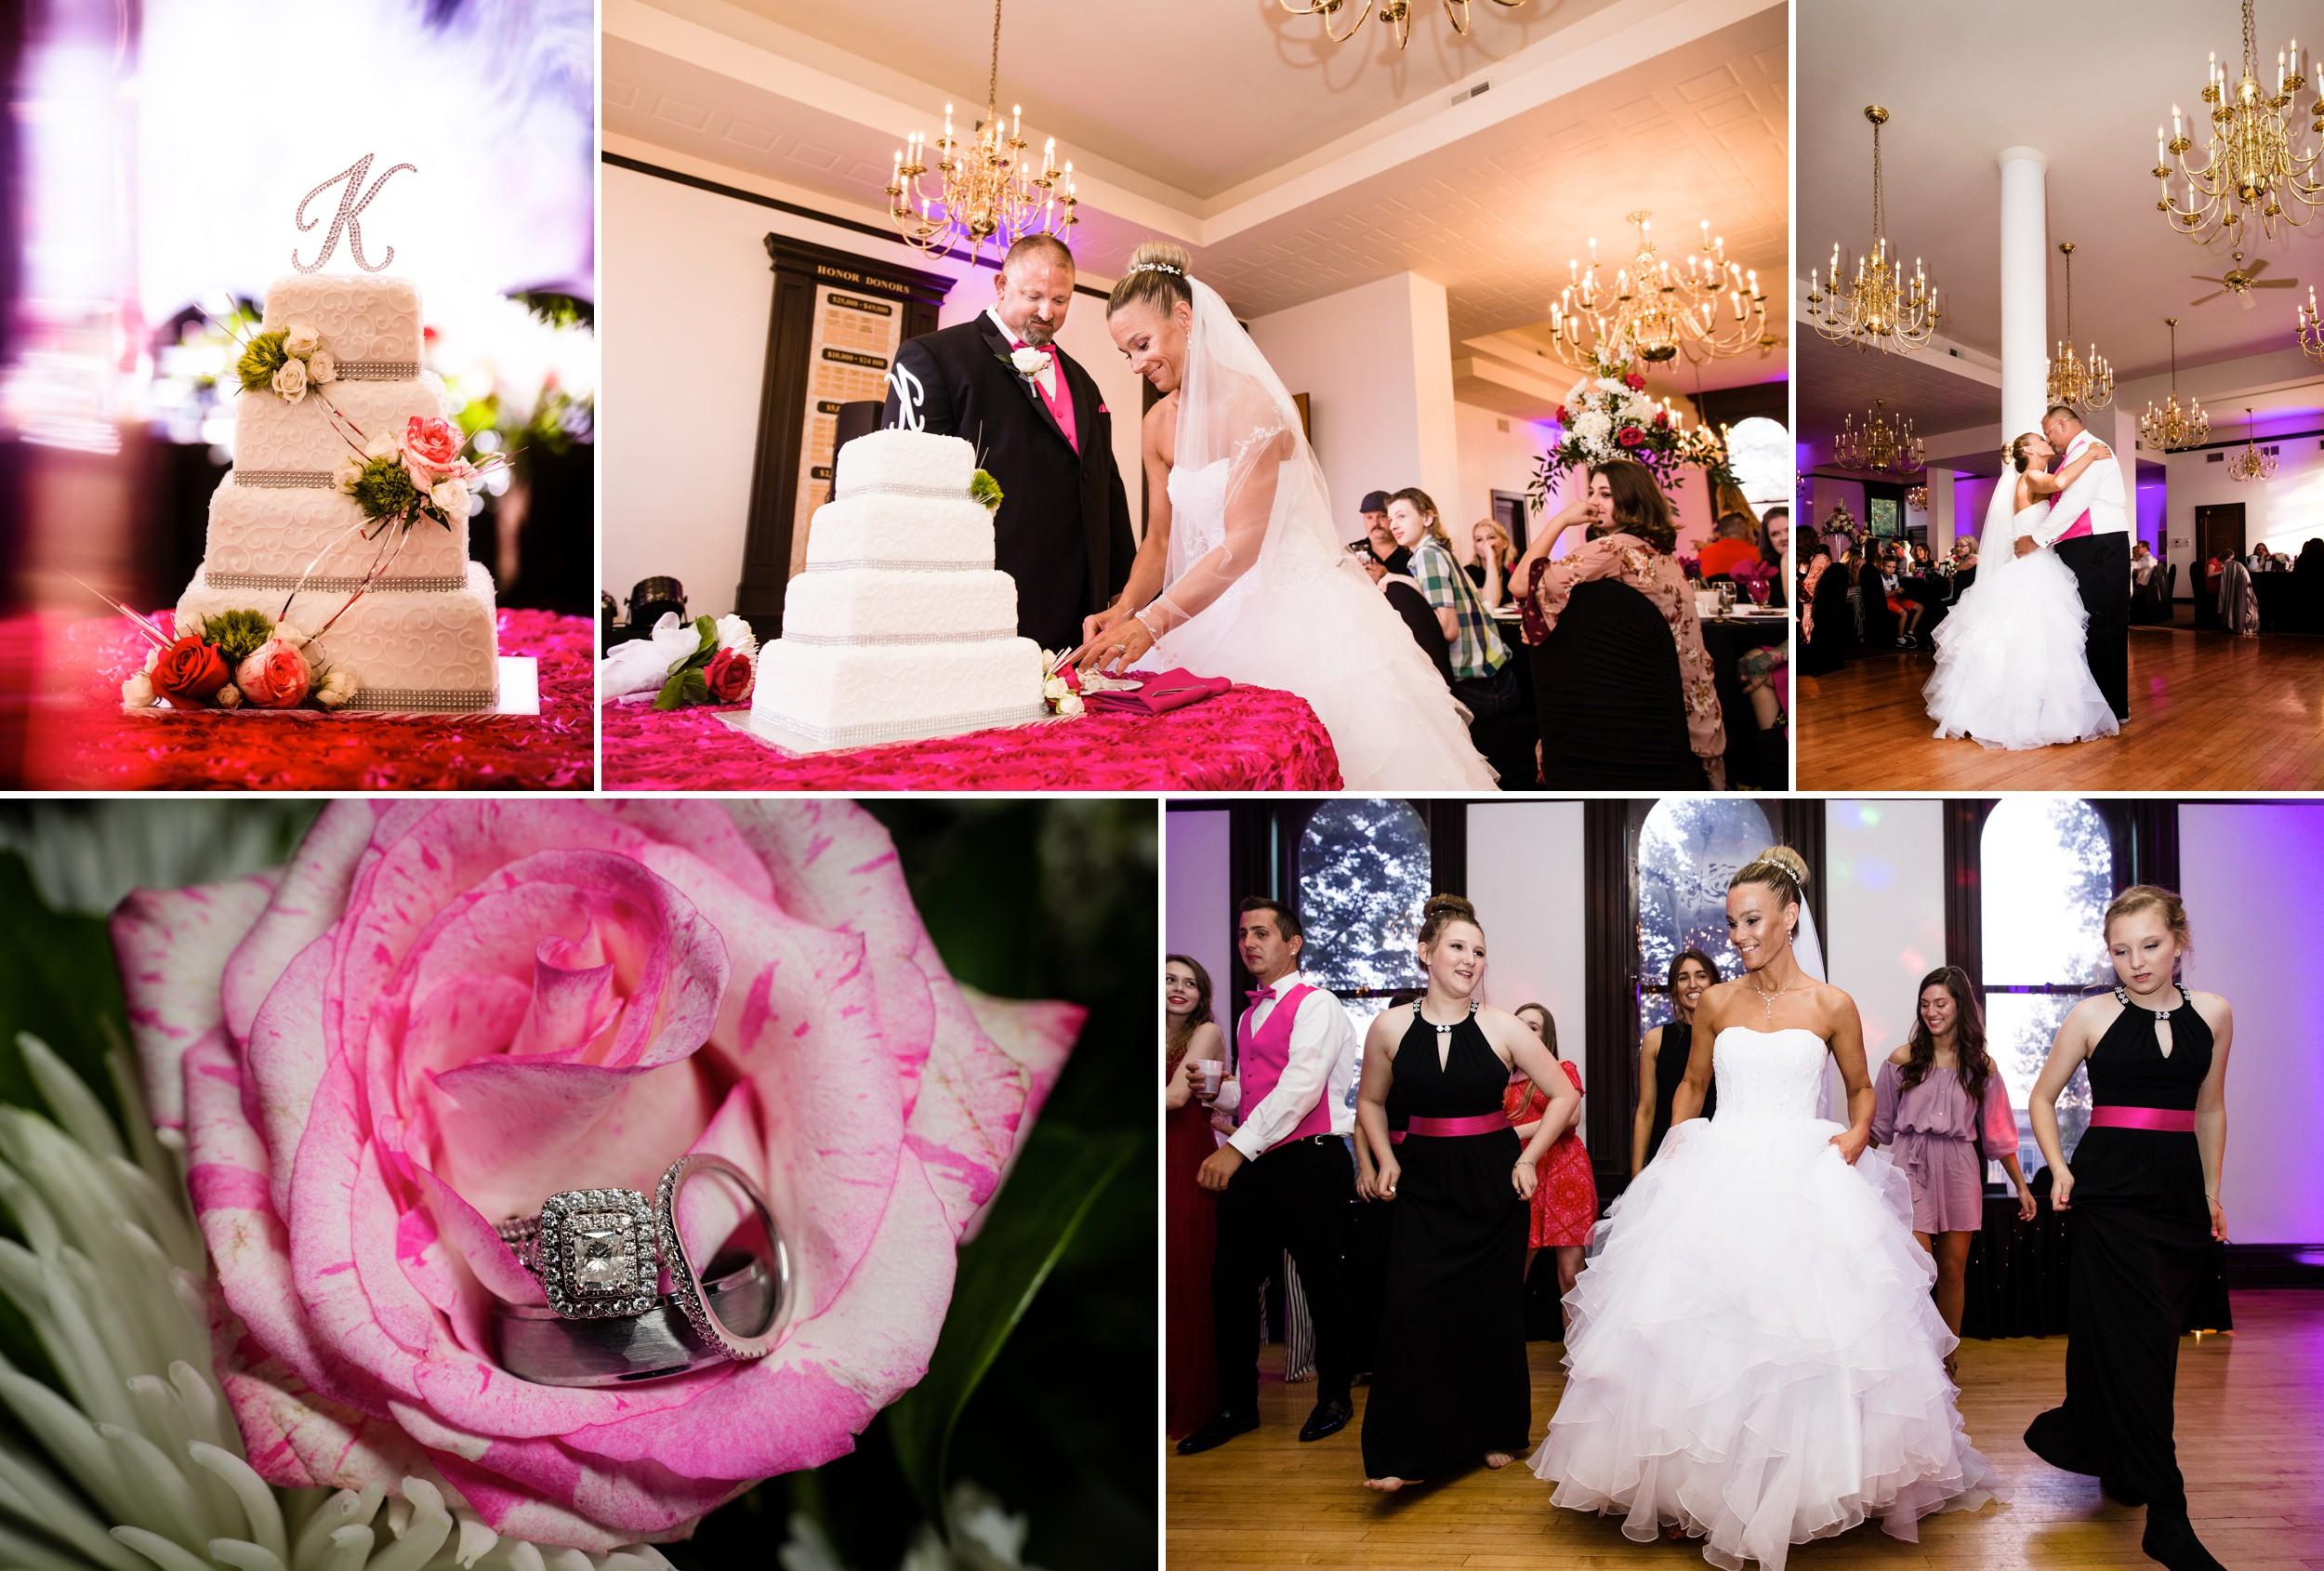 Wedding reception at Maki Ballroom.